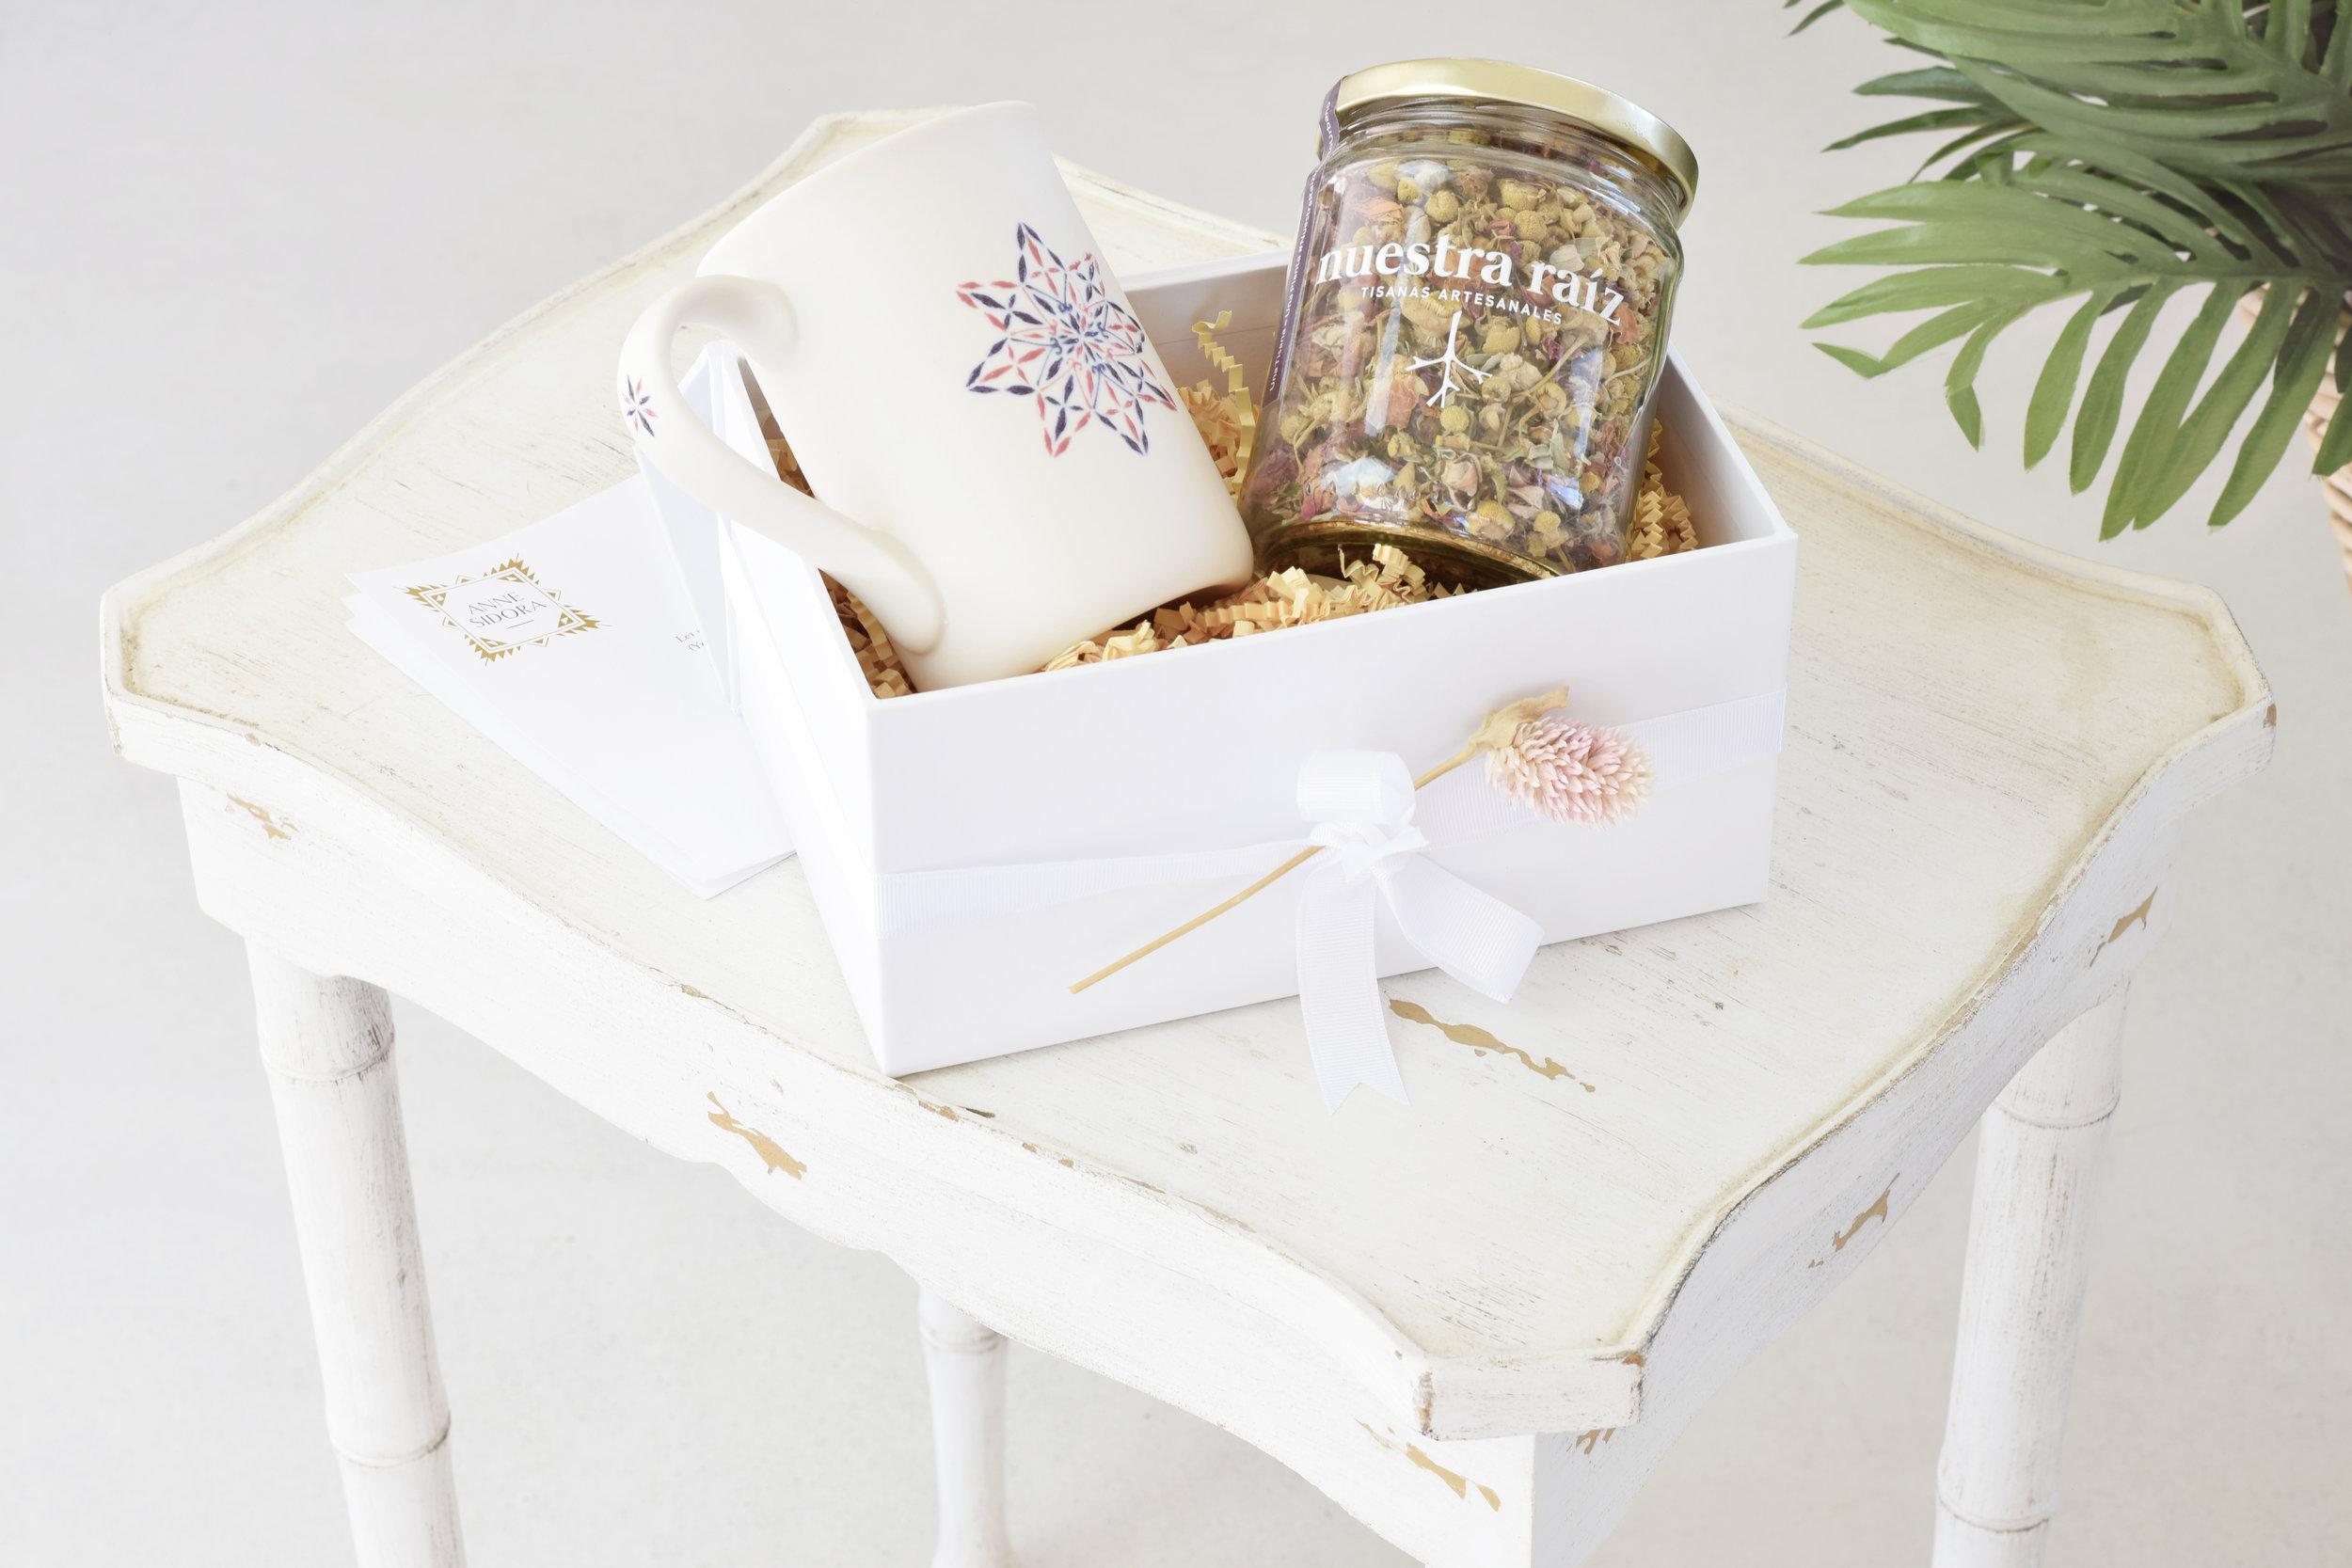 02-Anne_Sidora_Concept_Store_Gift_Box_Tea.jpg